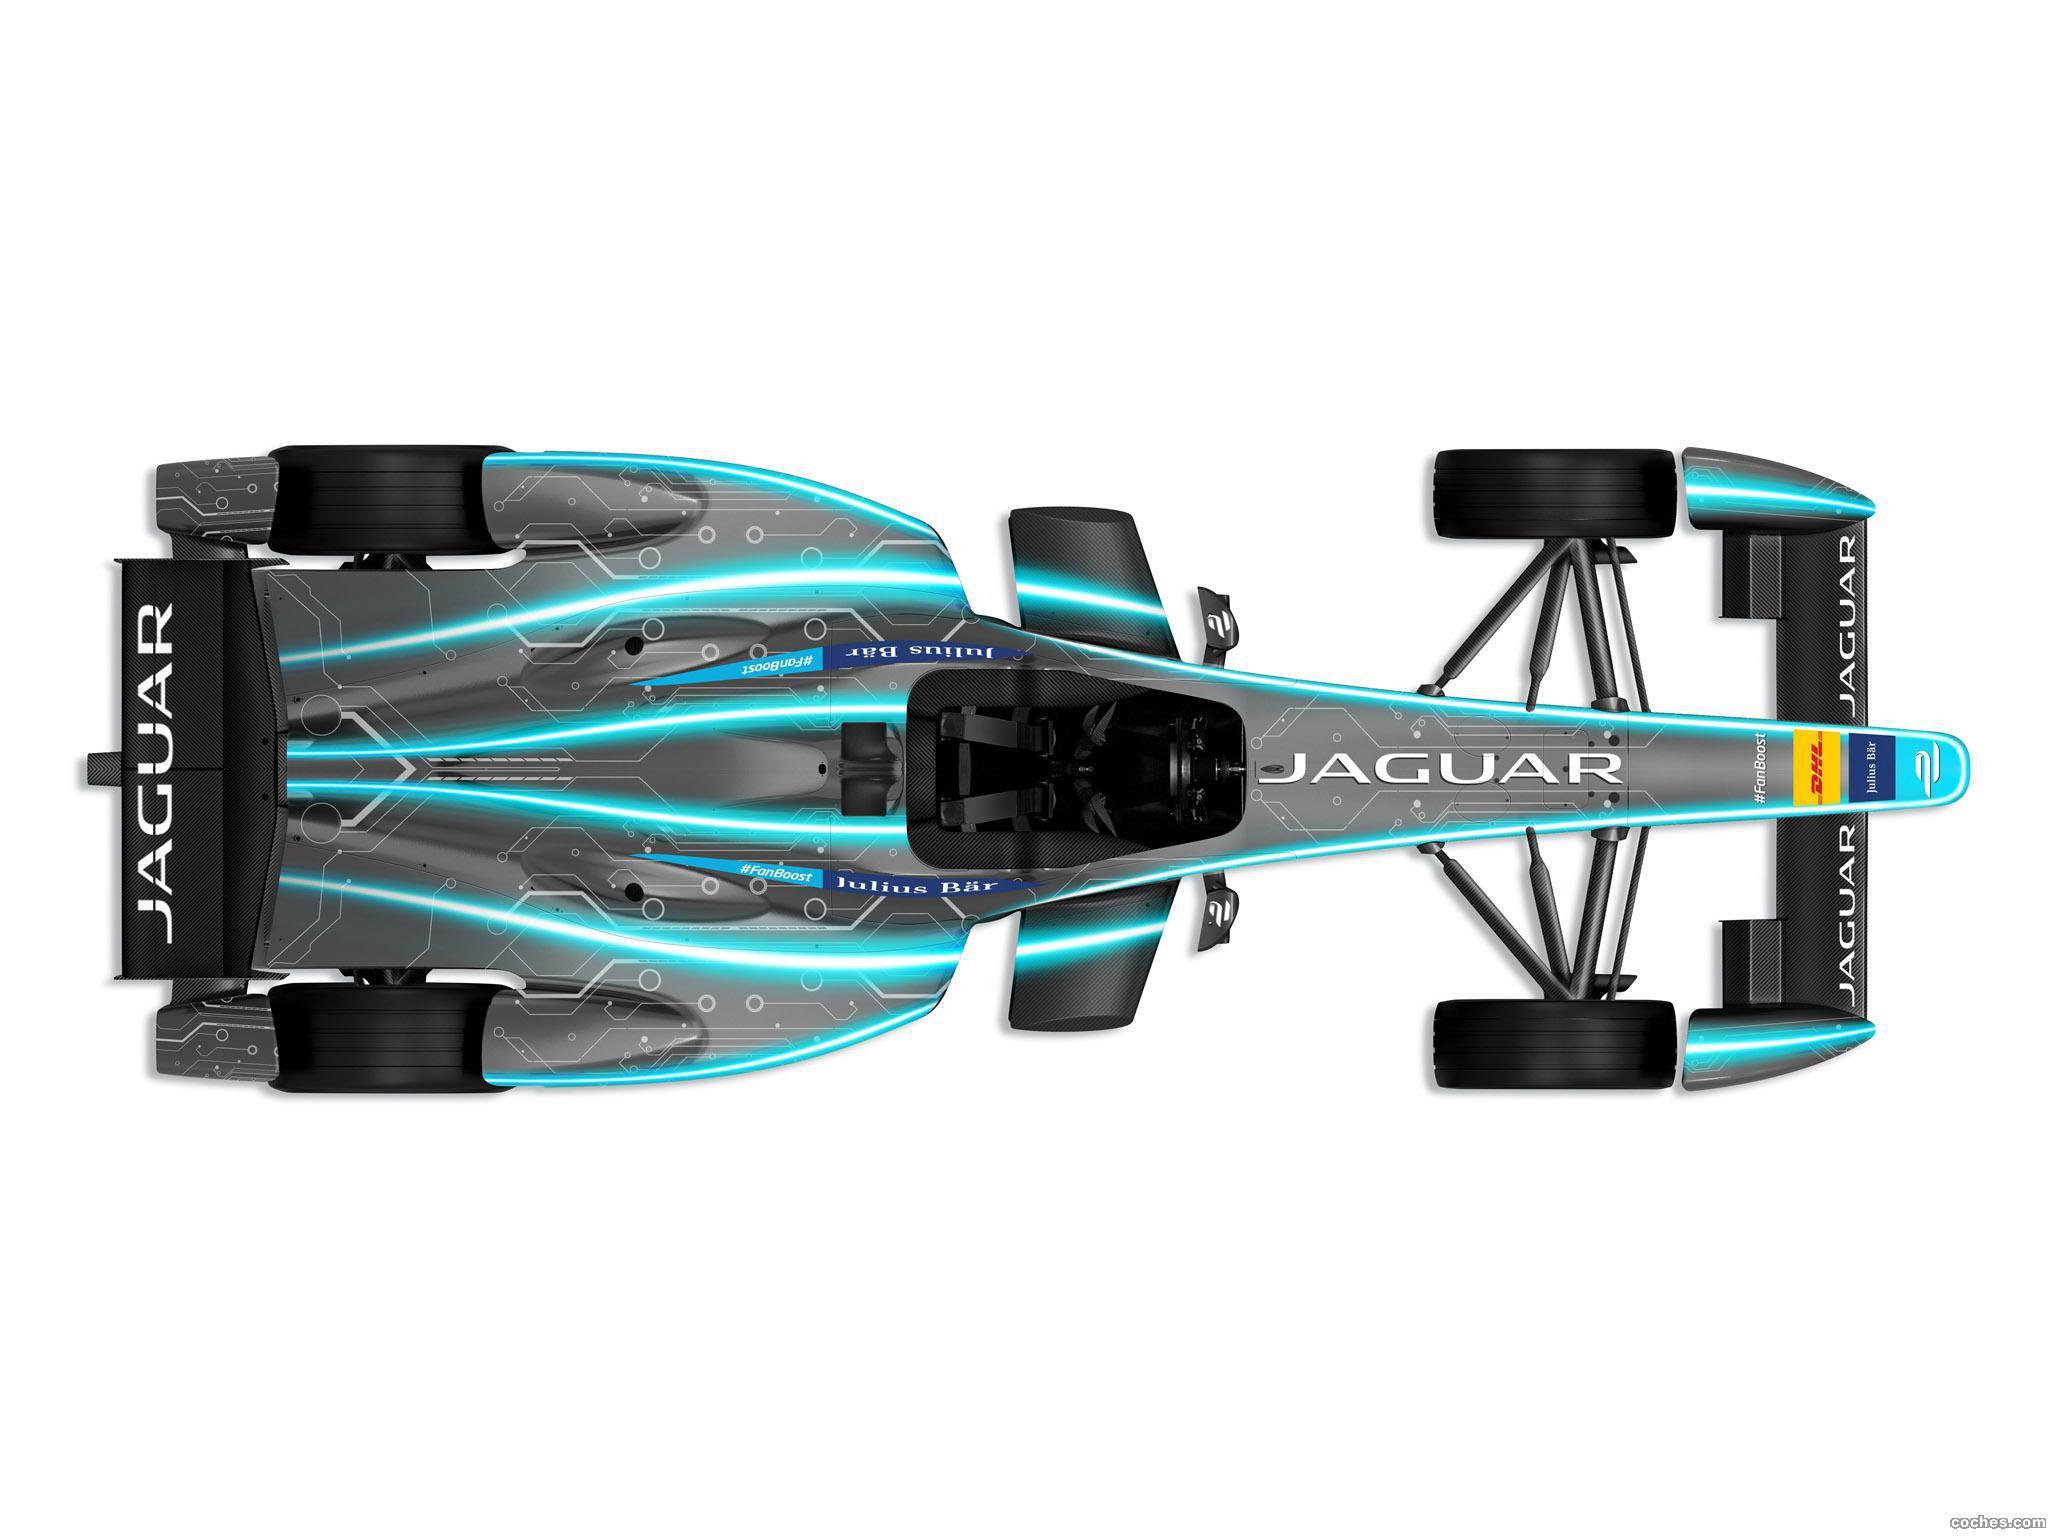 Foto 2 de Jaguar Formula E Race Car Concept 2015